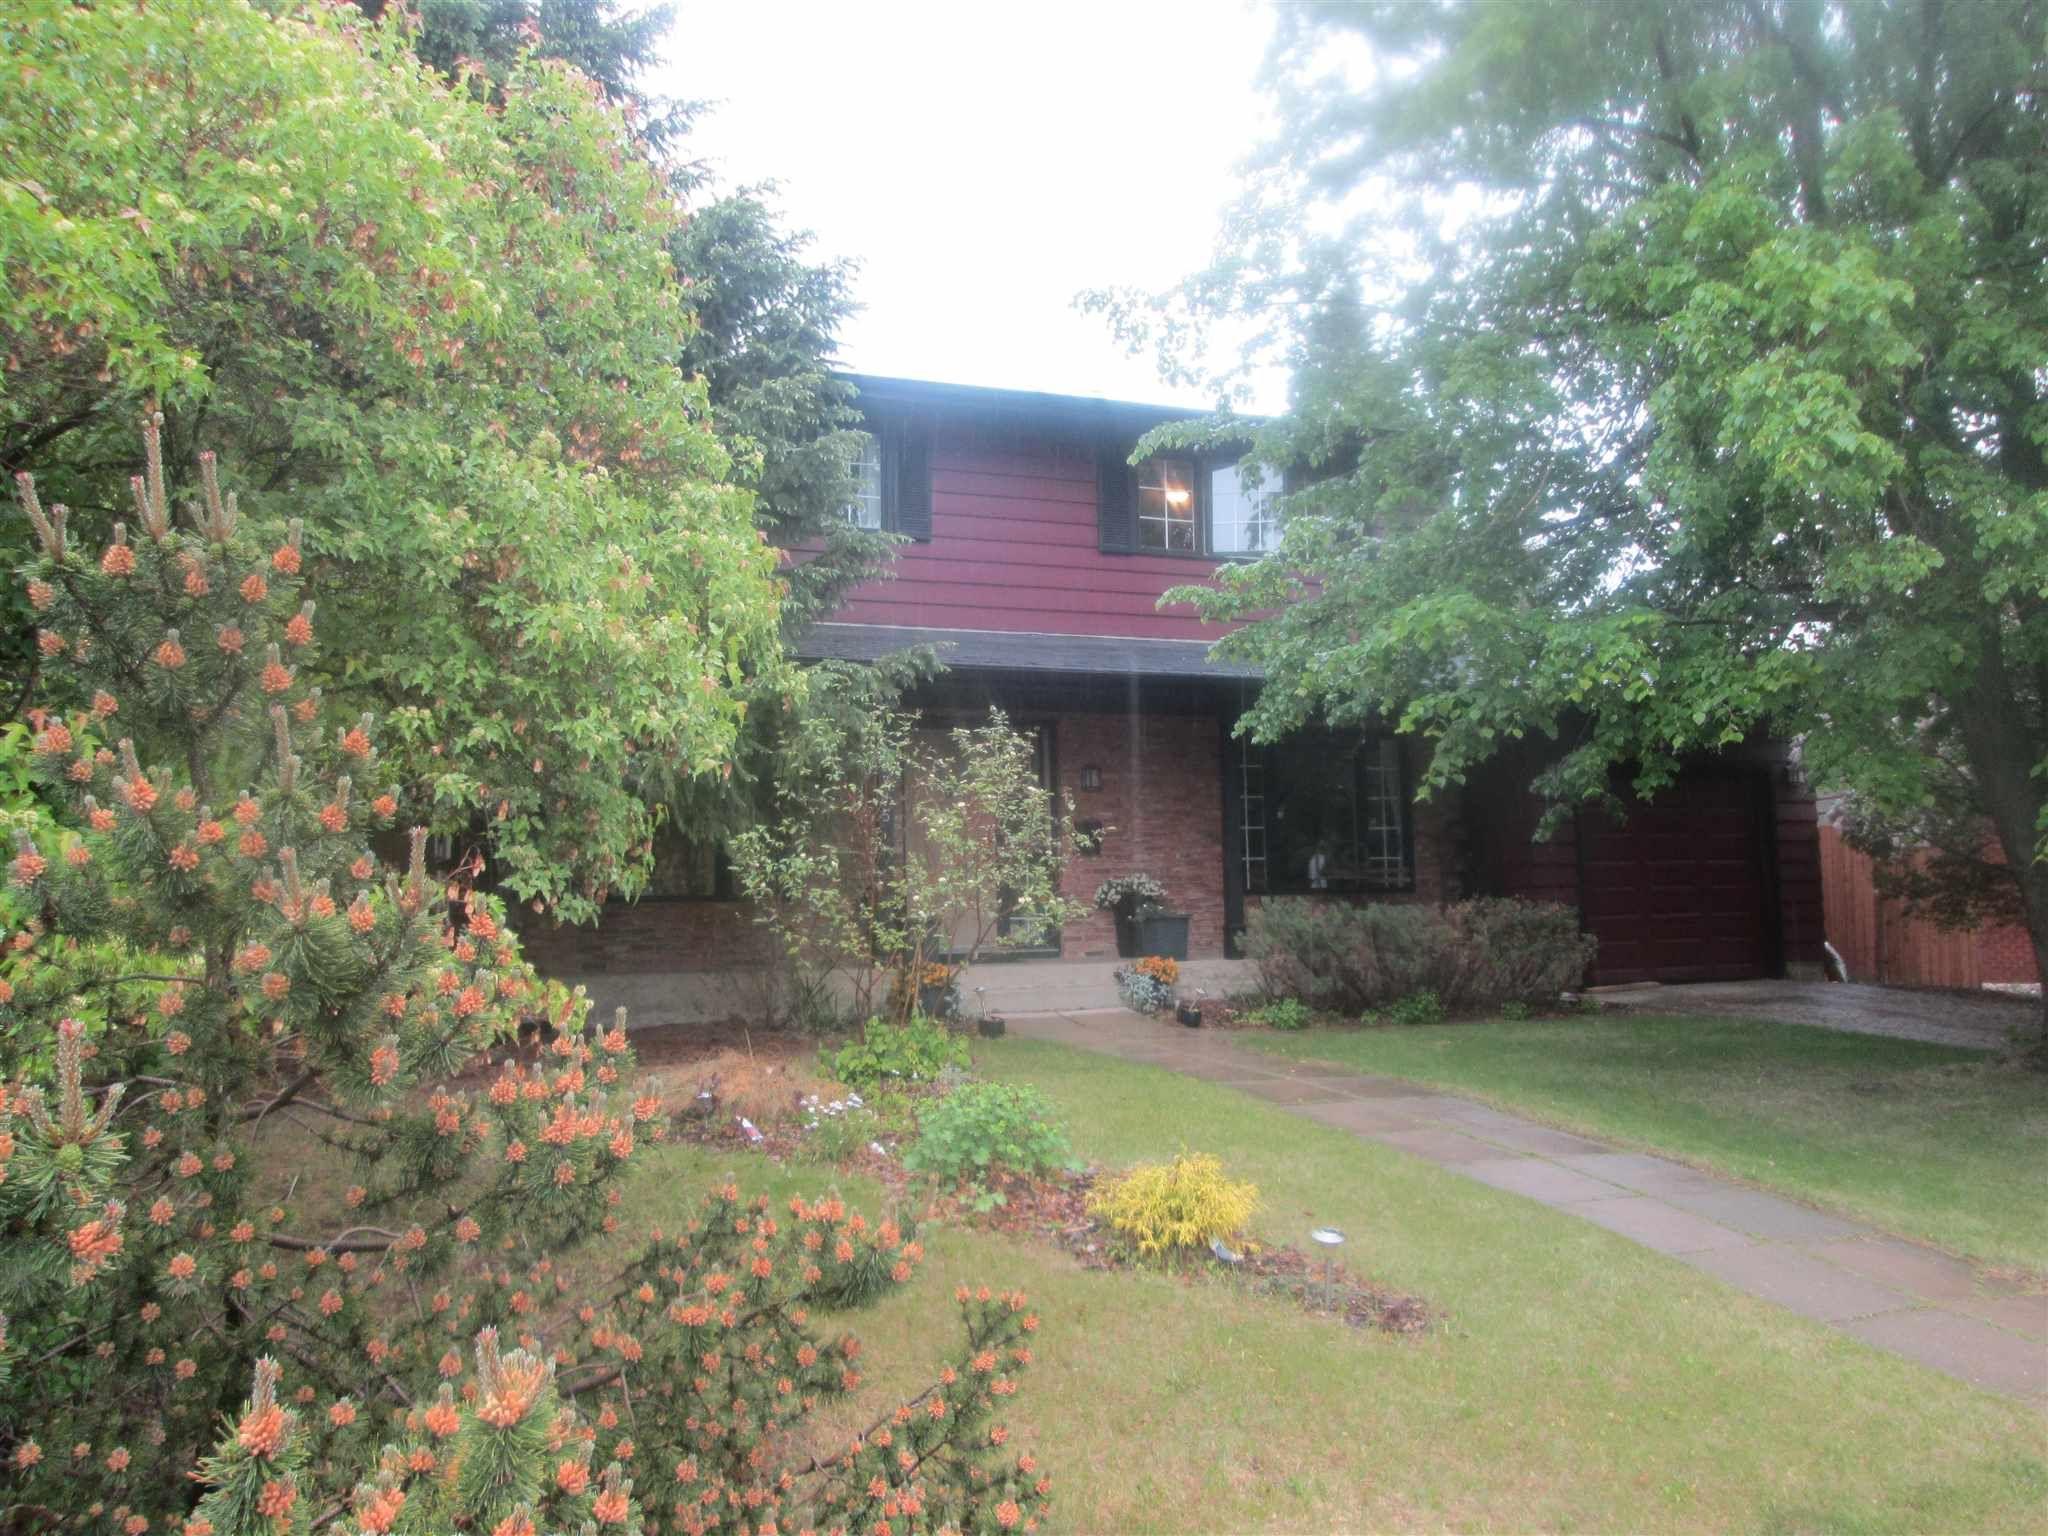 Main Photo: 5315 143 Street in Edmonton: Zone 14 House for sale : MLS®# E4249232